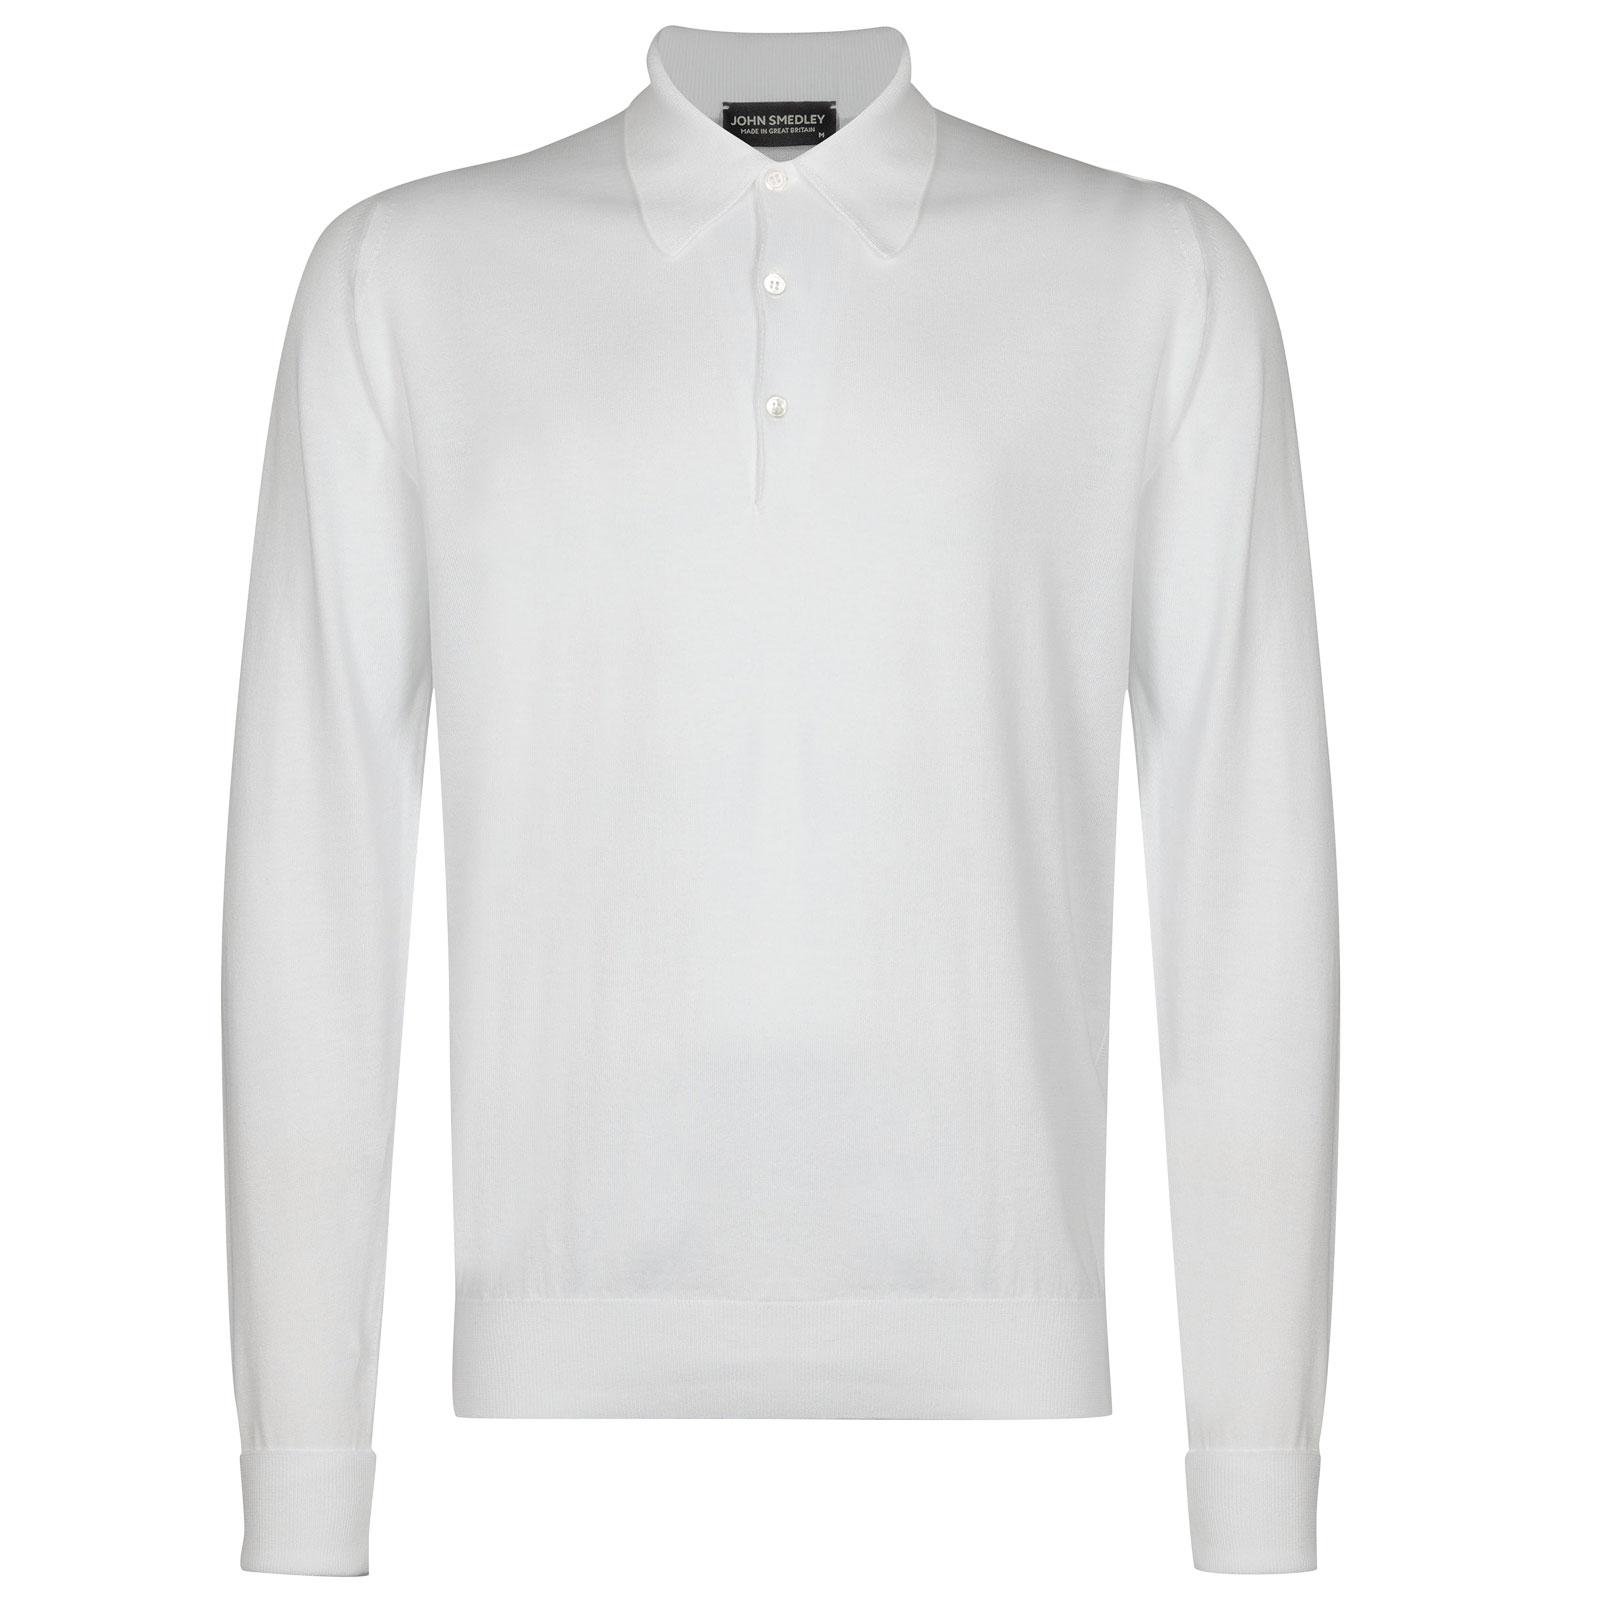 John Smedley finchley Sea Island Cotton Shirt in White-XS